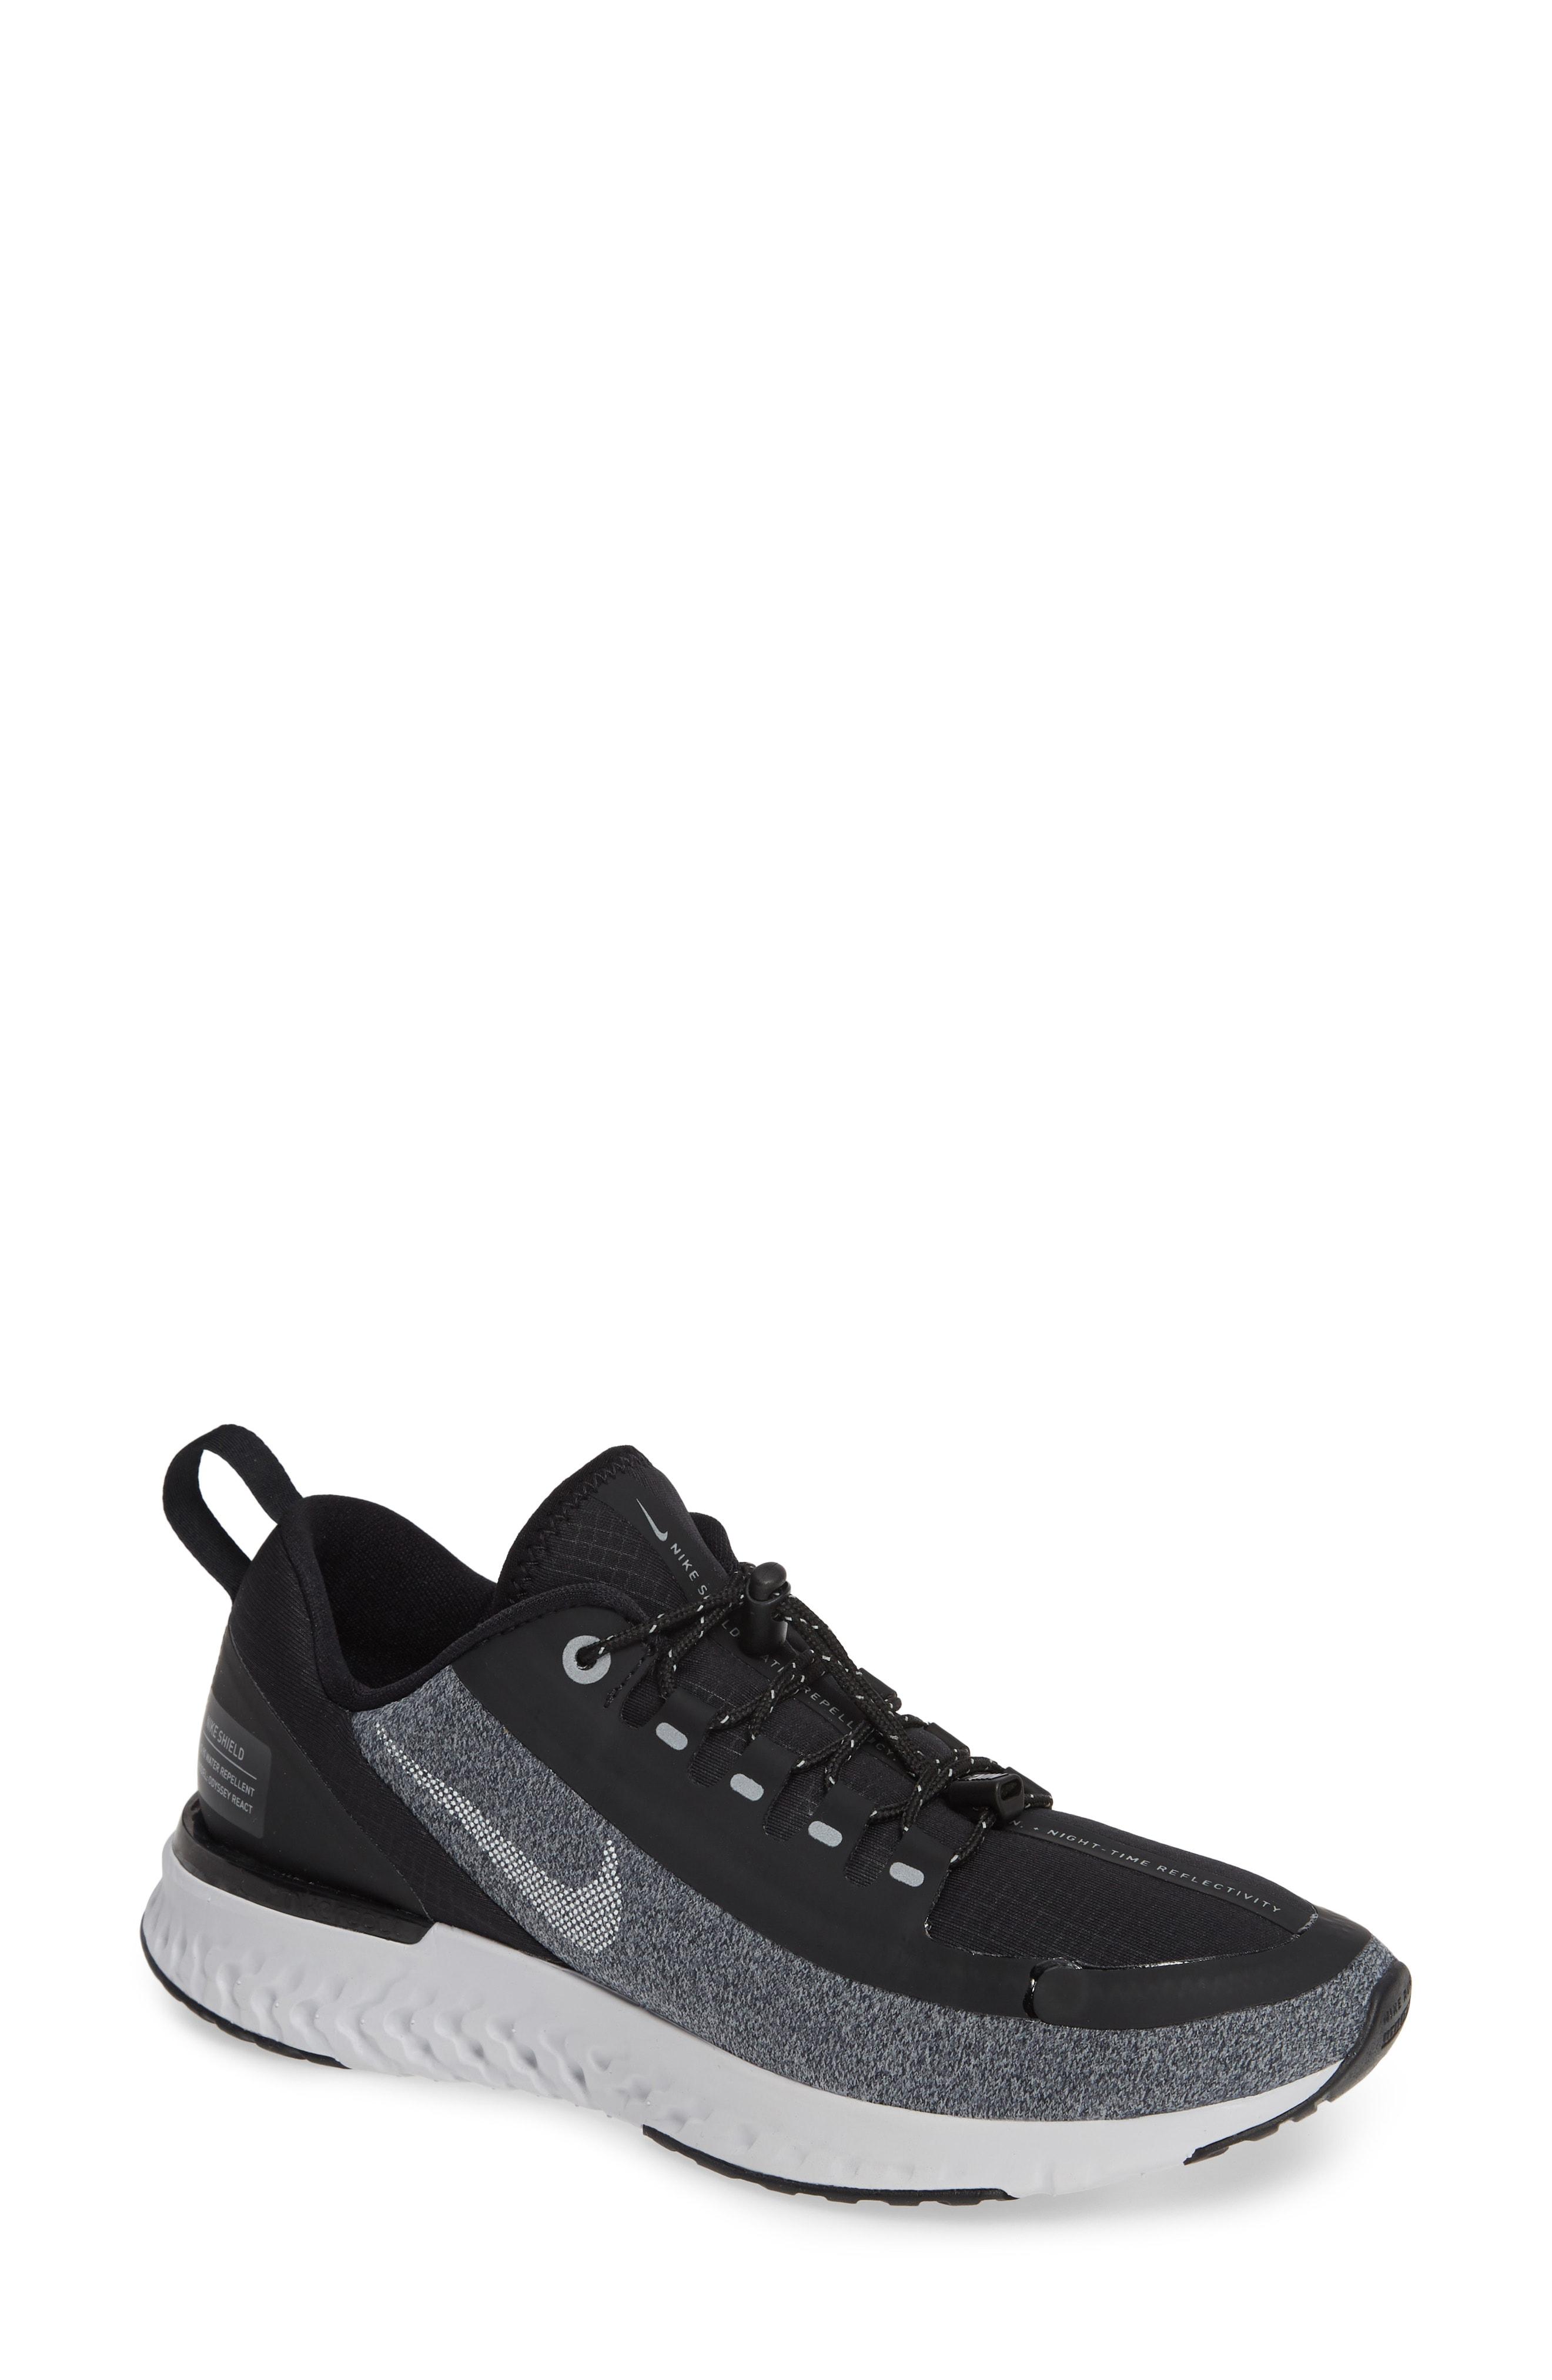 Nike Odyssey React Shield Water Repellent Running Shoe (Women)